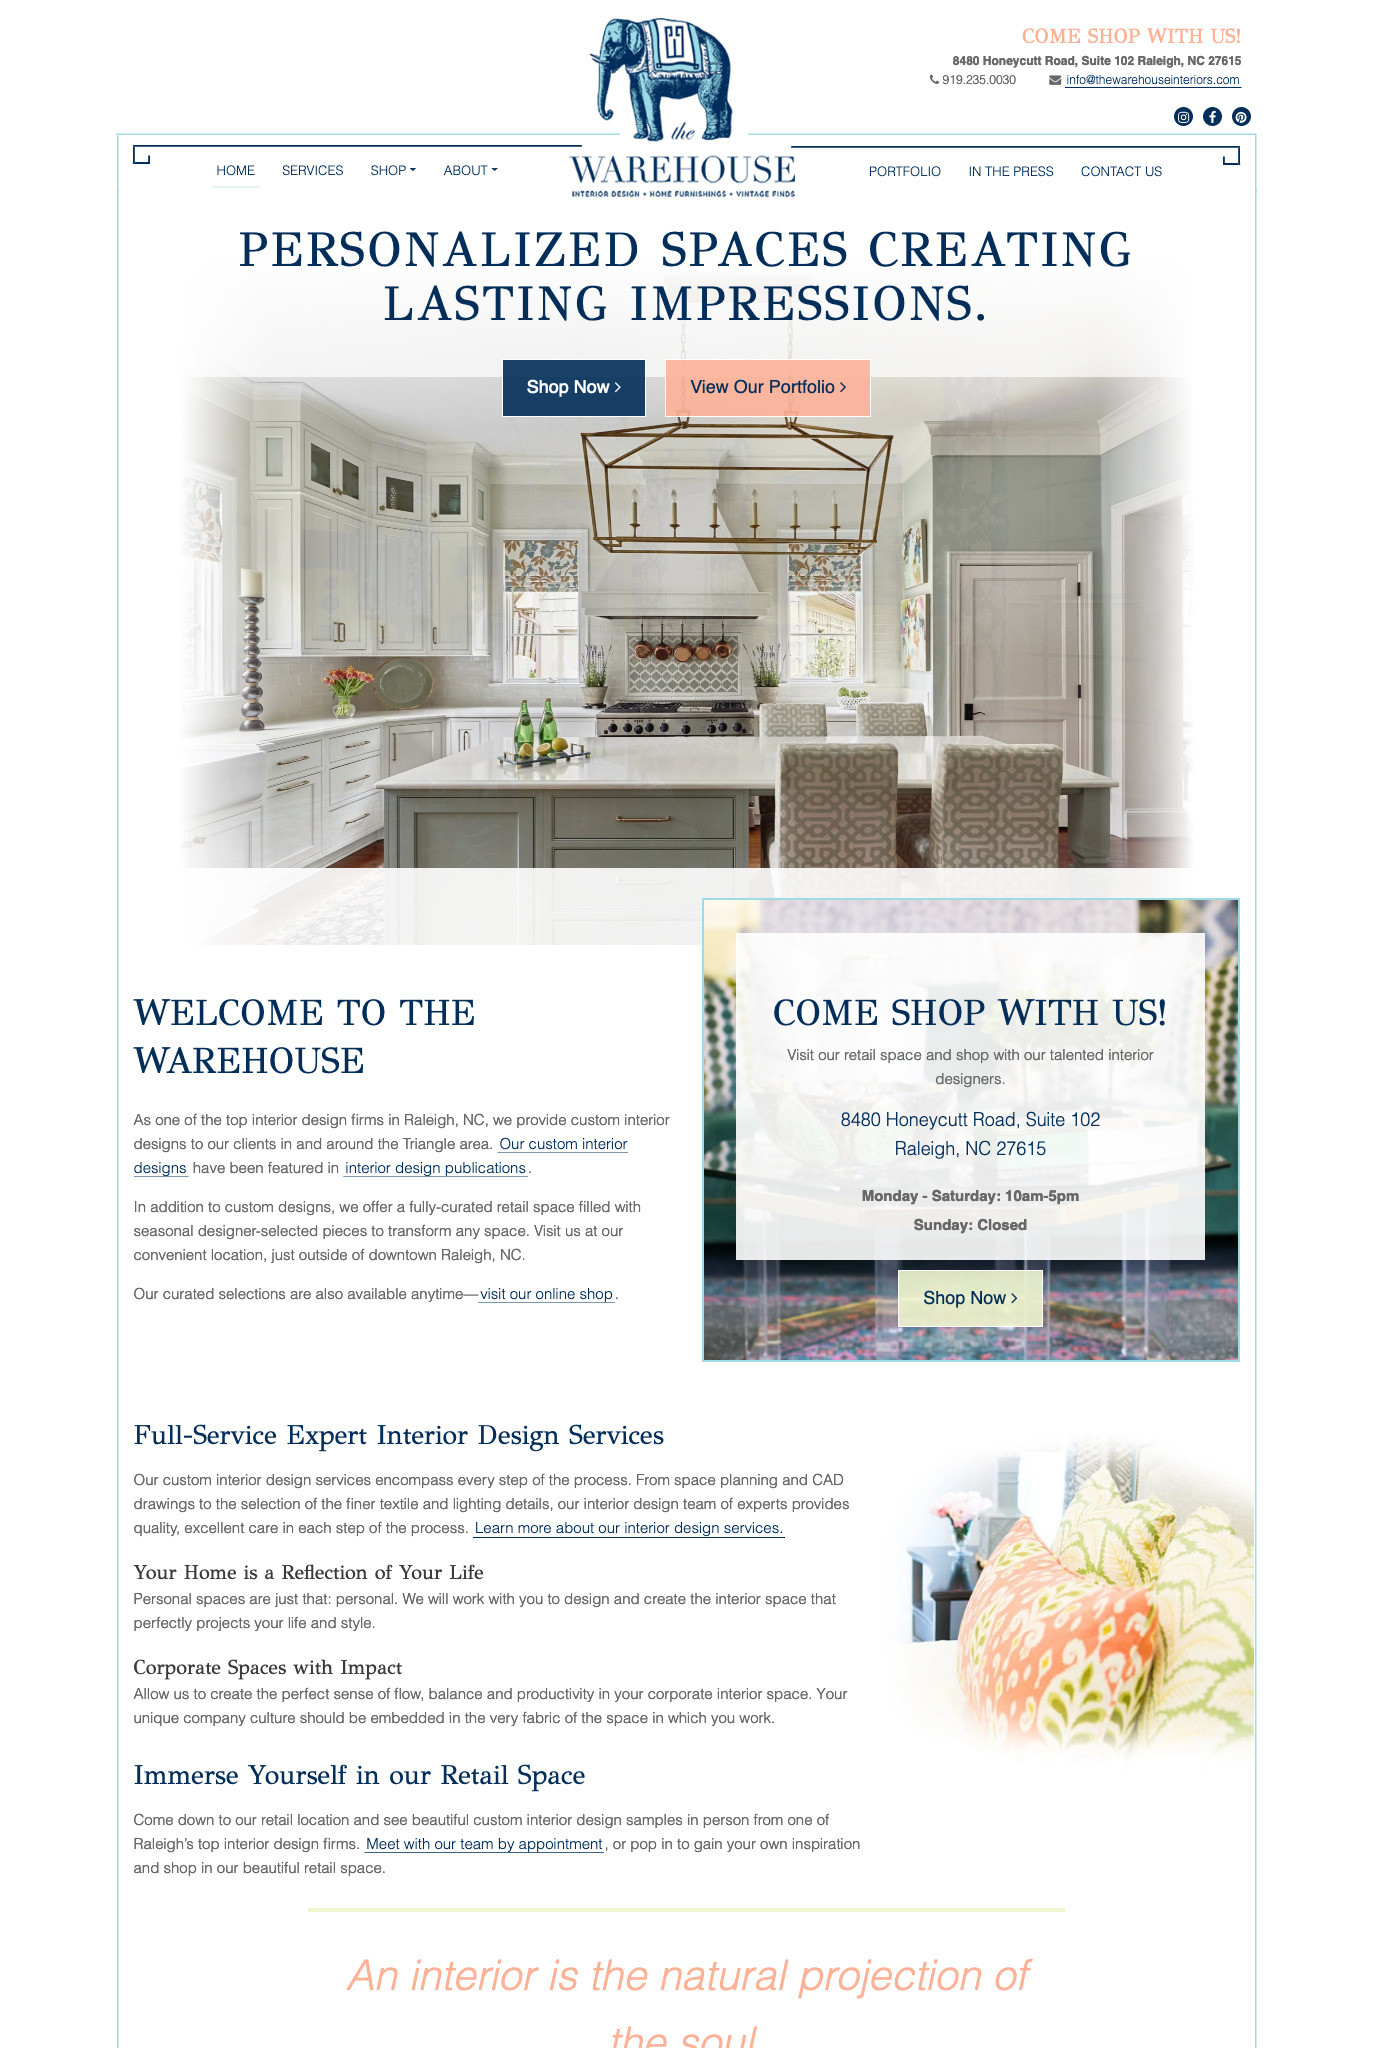 Custom WordPress website design for Raleigh business solves visitor challenges.